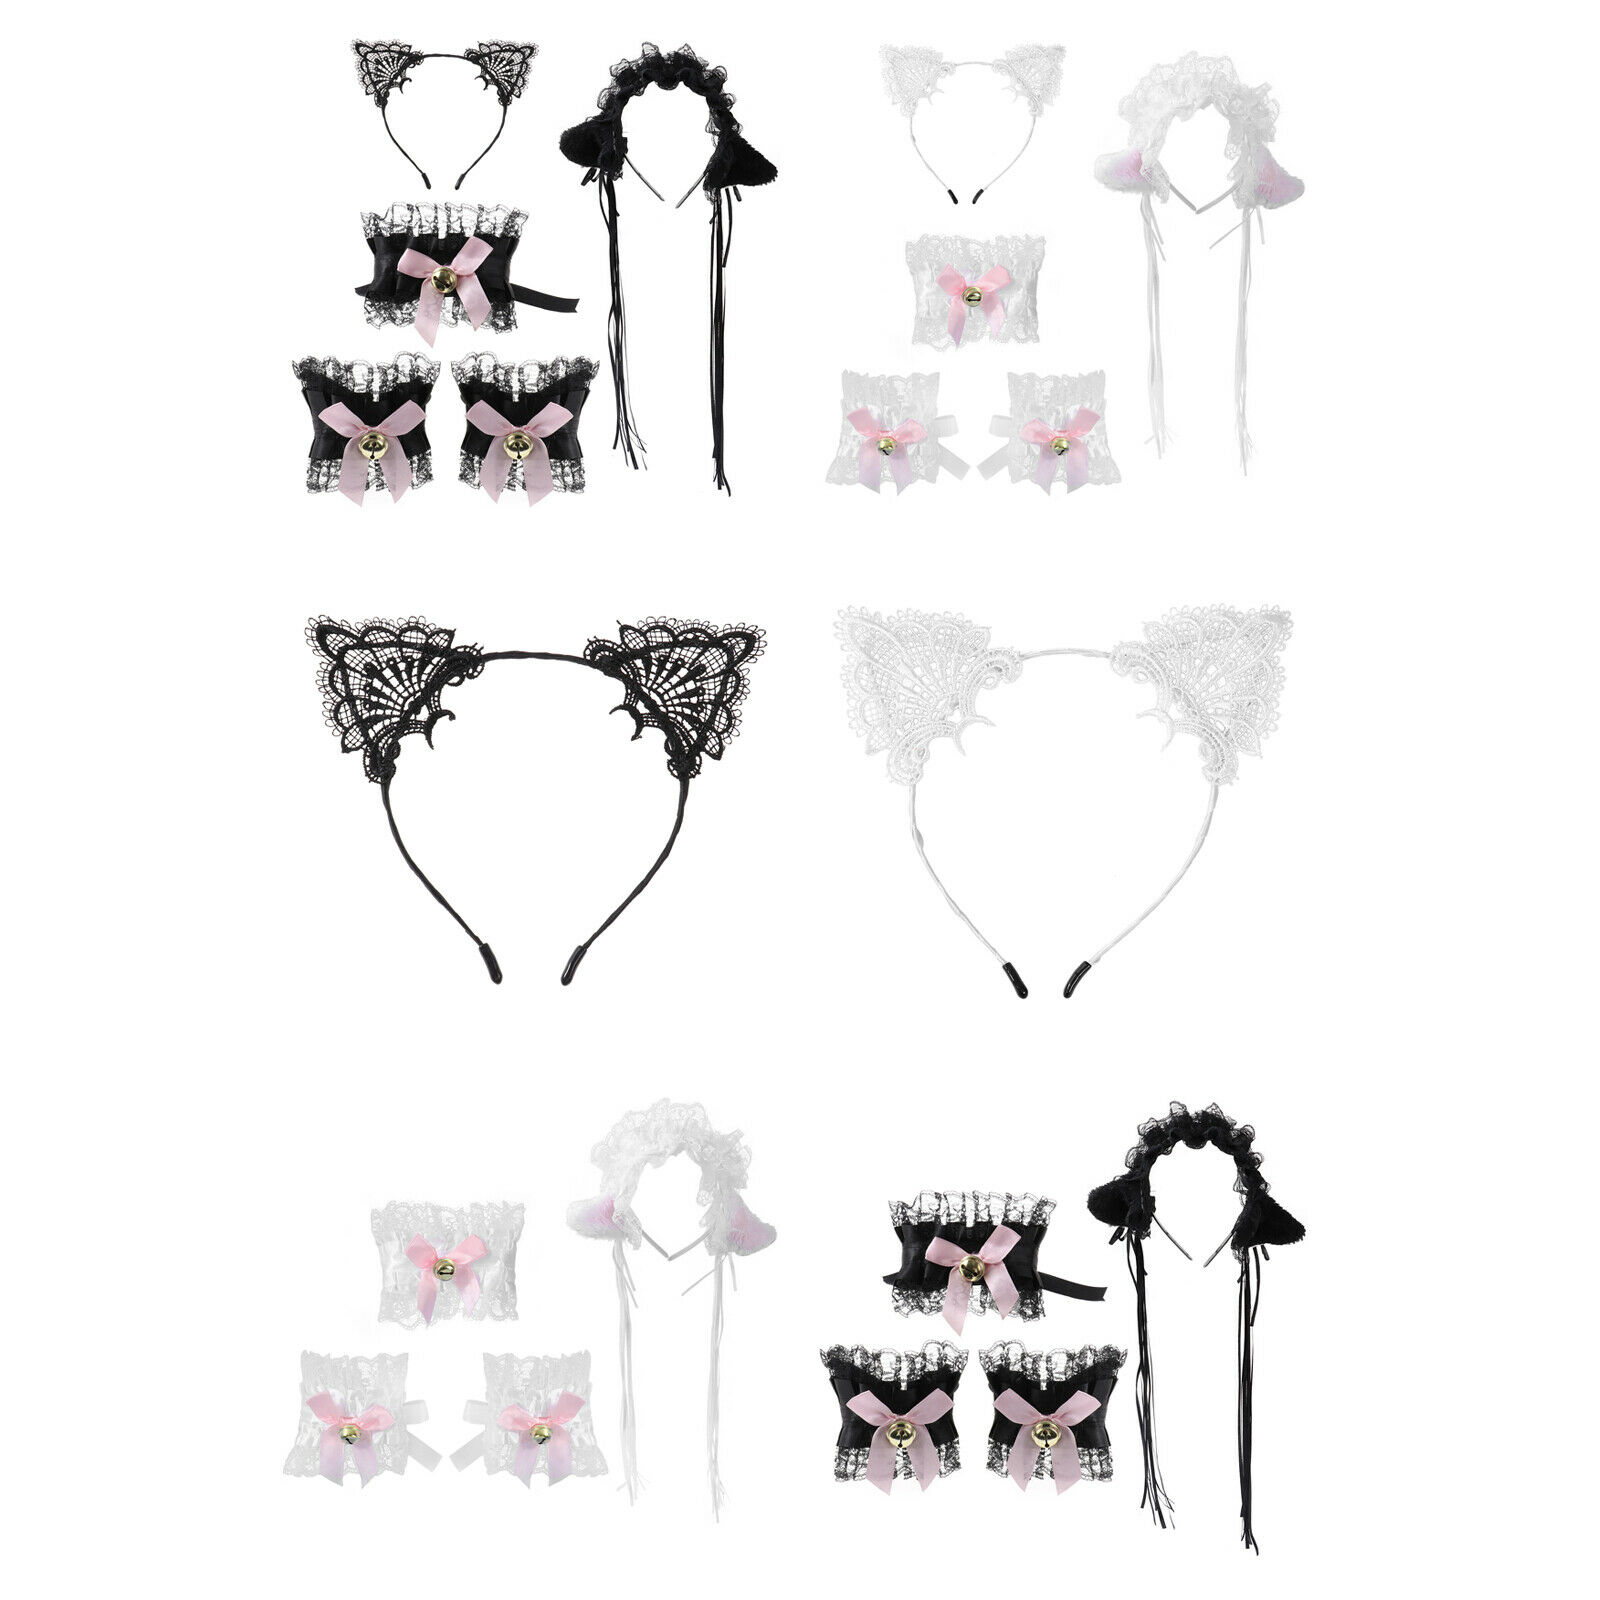 Lace Ruffle Bells Decor Tassel Cat Ears Hair Hoop Bowknot Collar Wristband Set